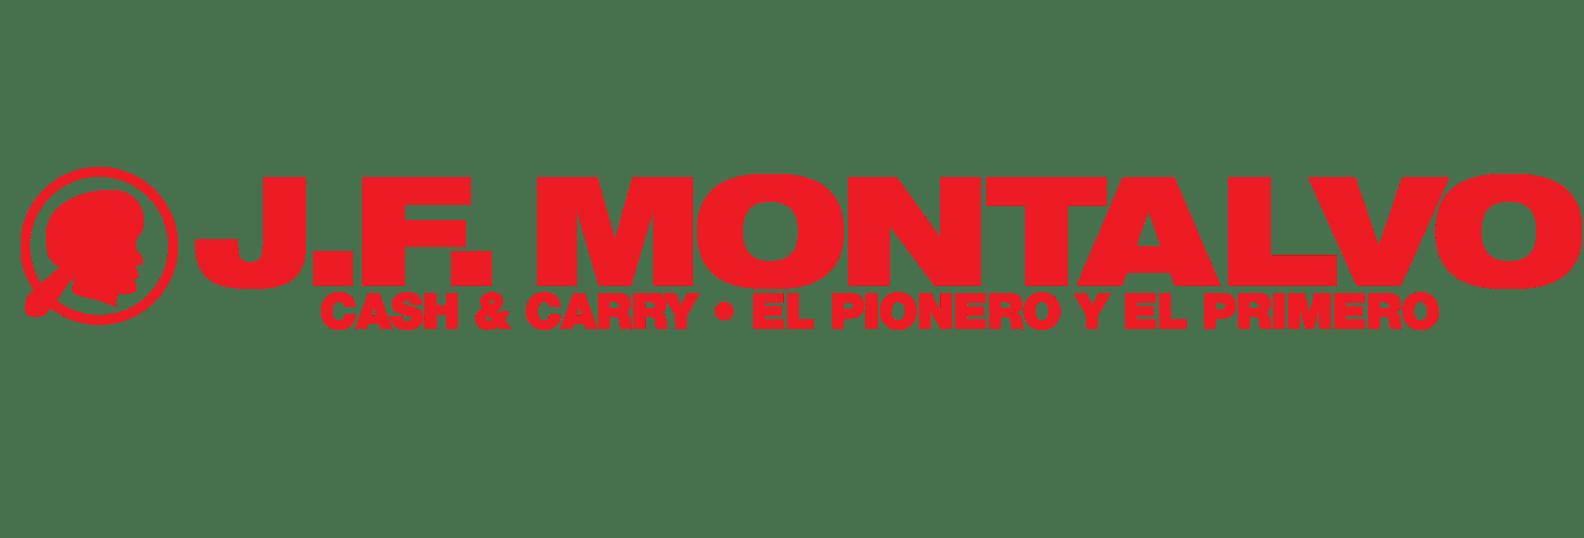 JF Montalvo logo.